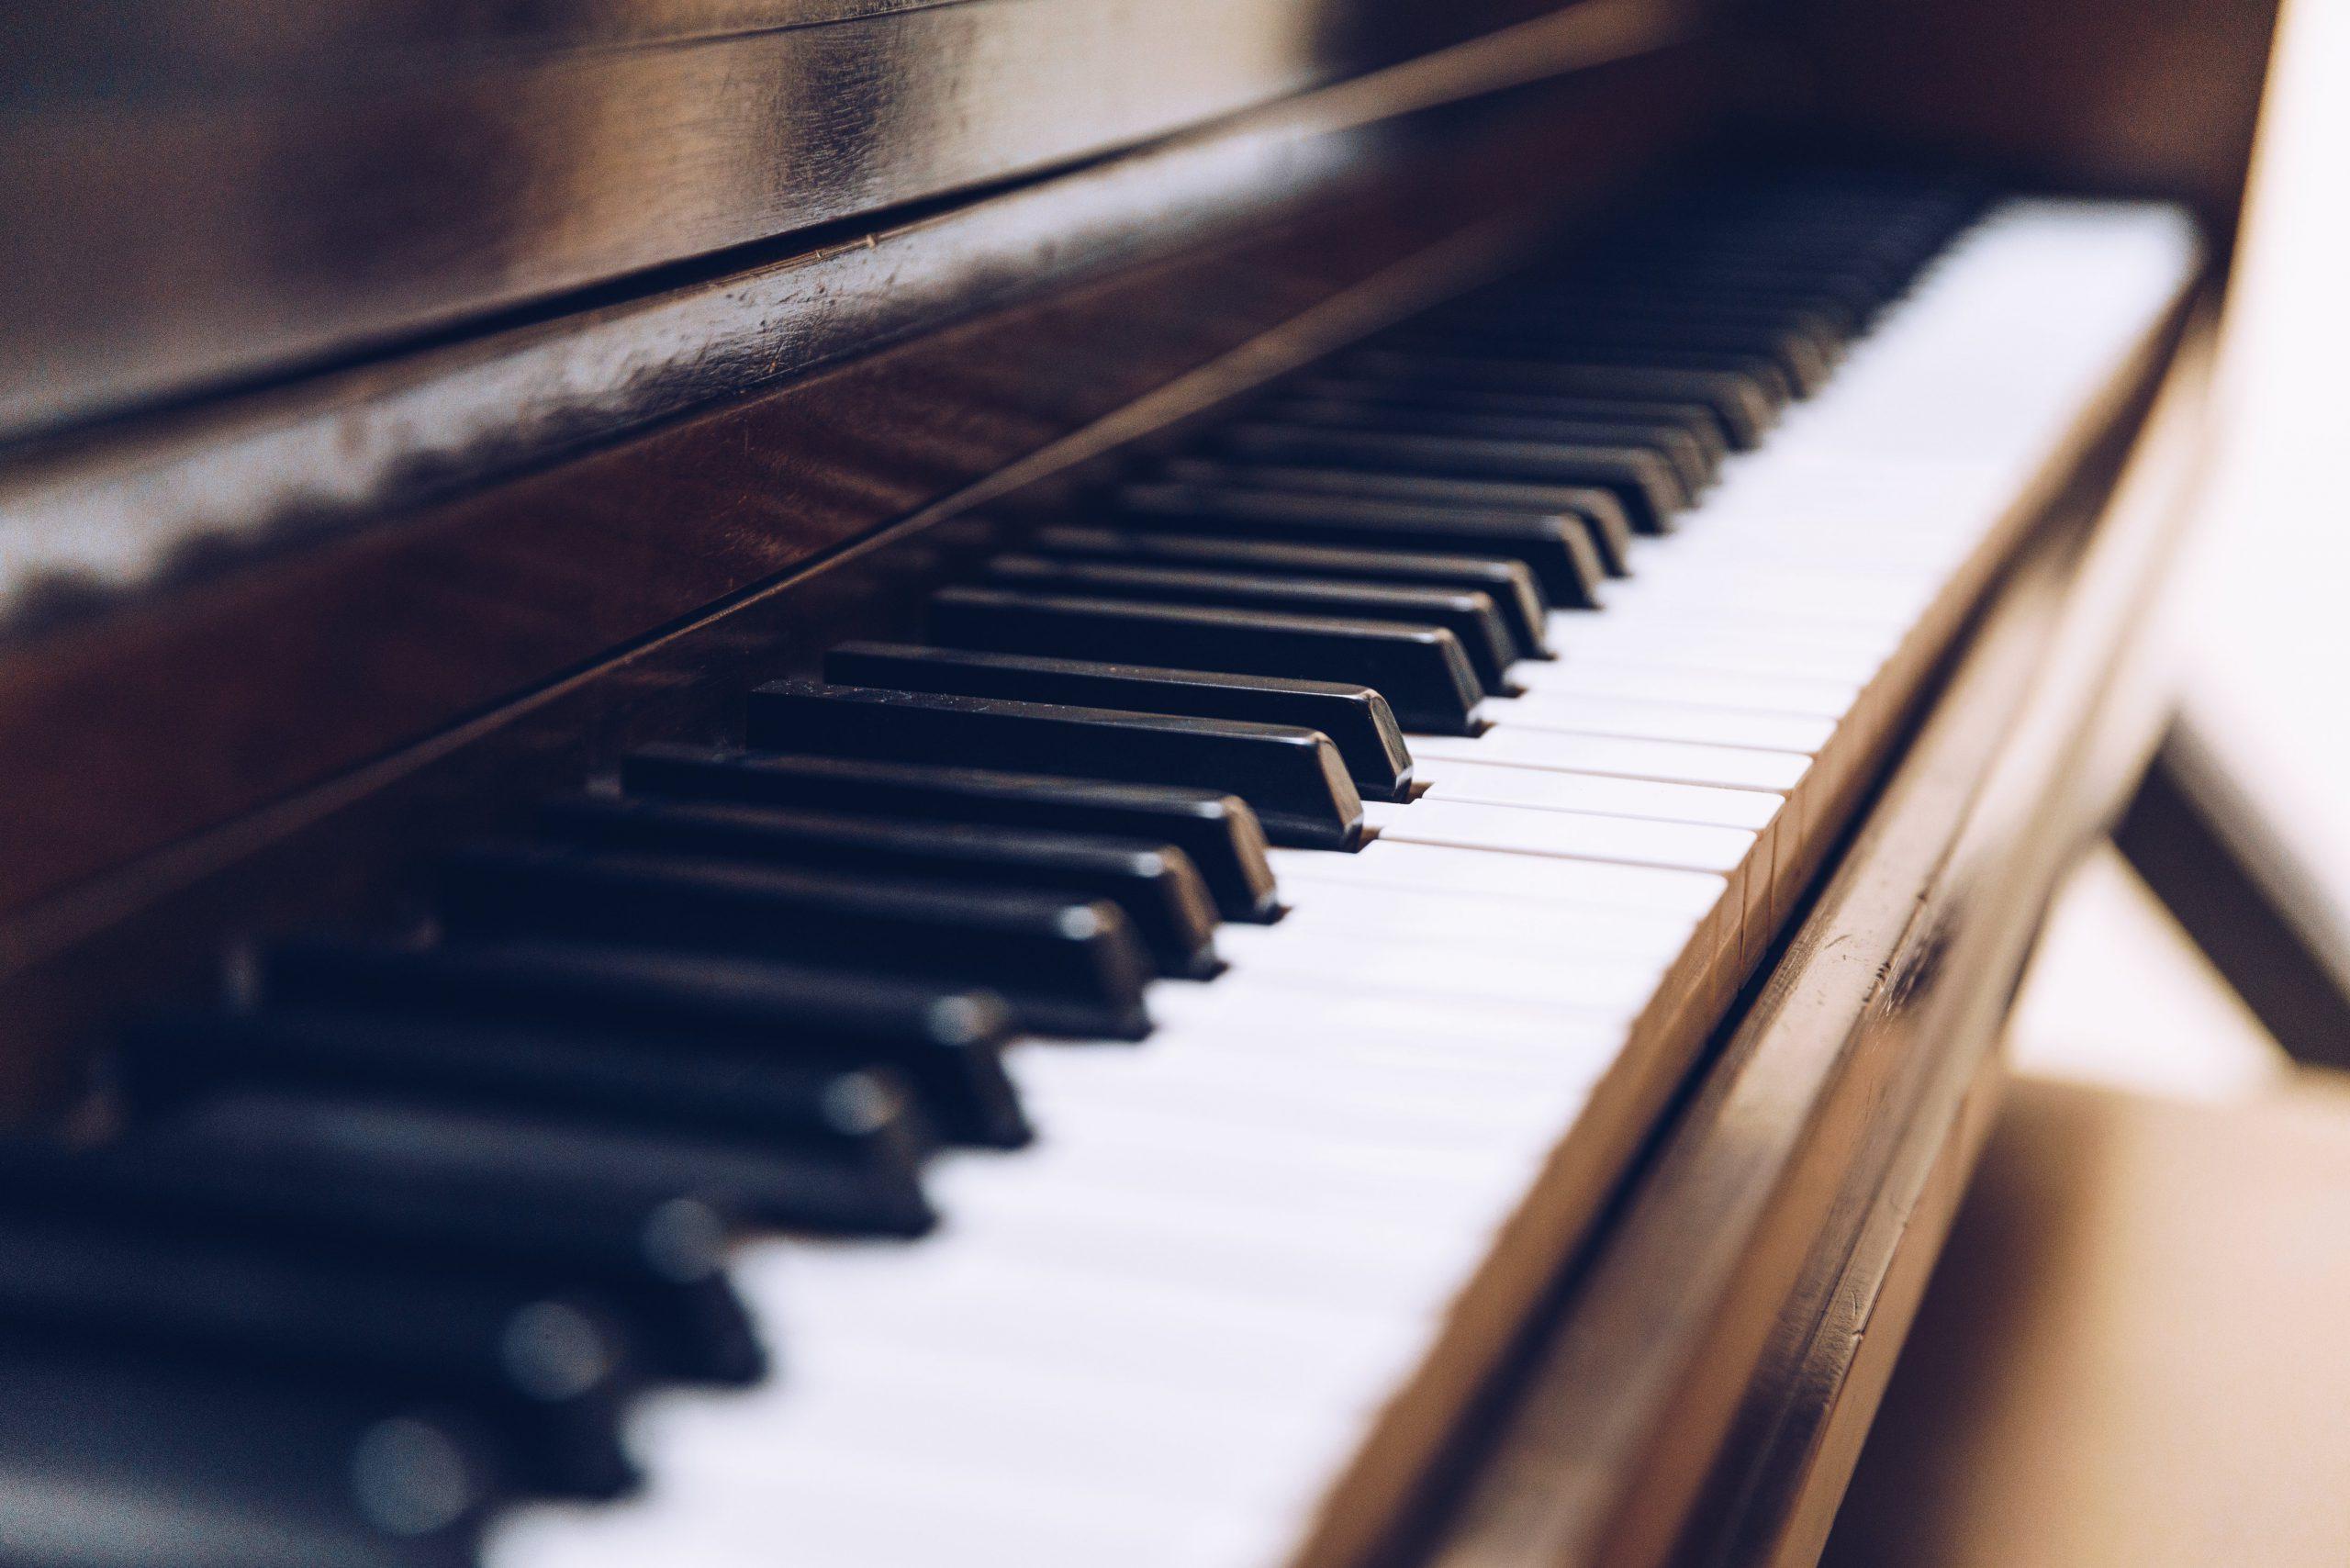 piano-keys-close-up